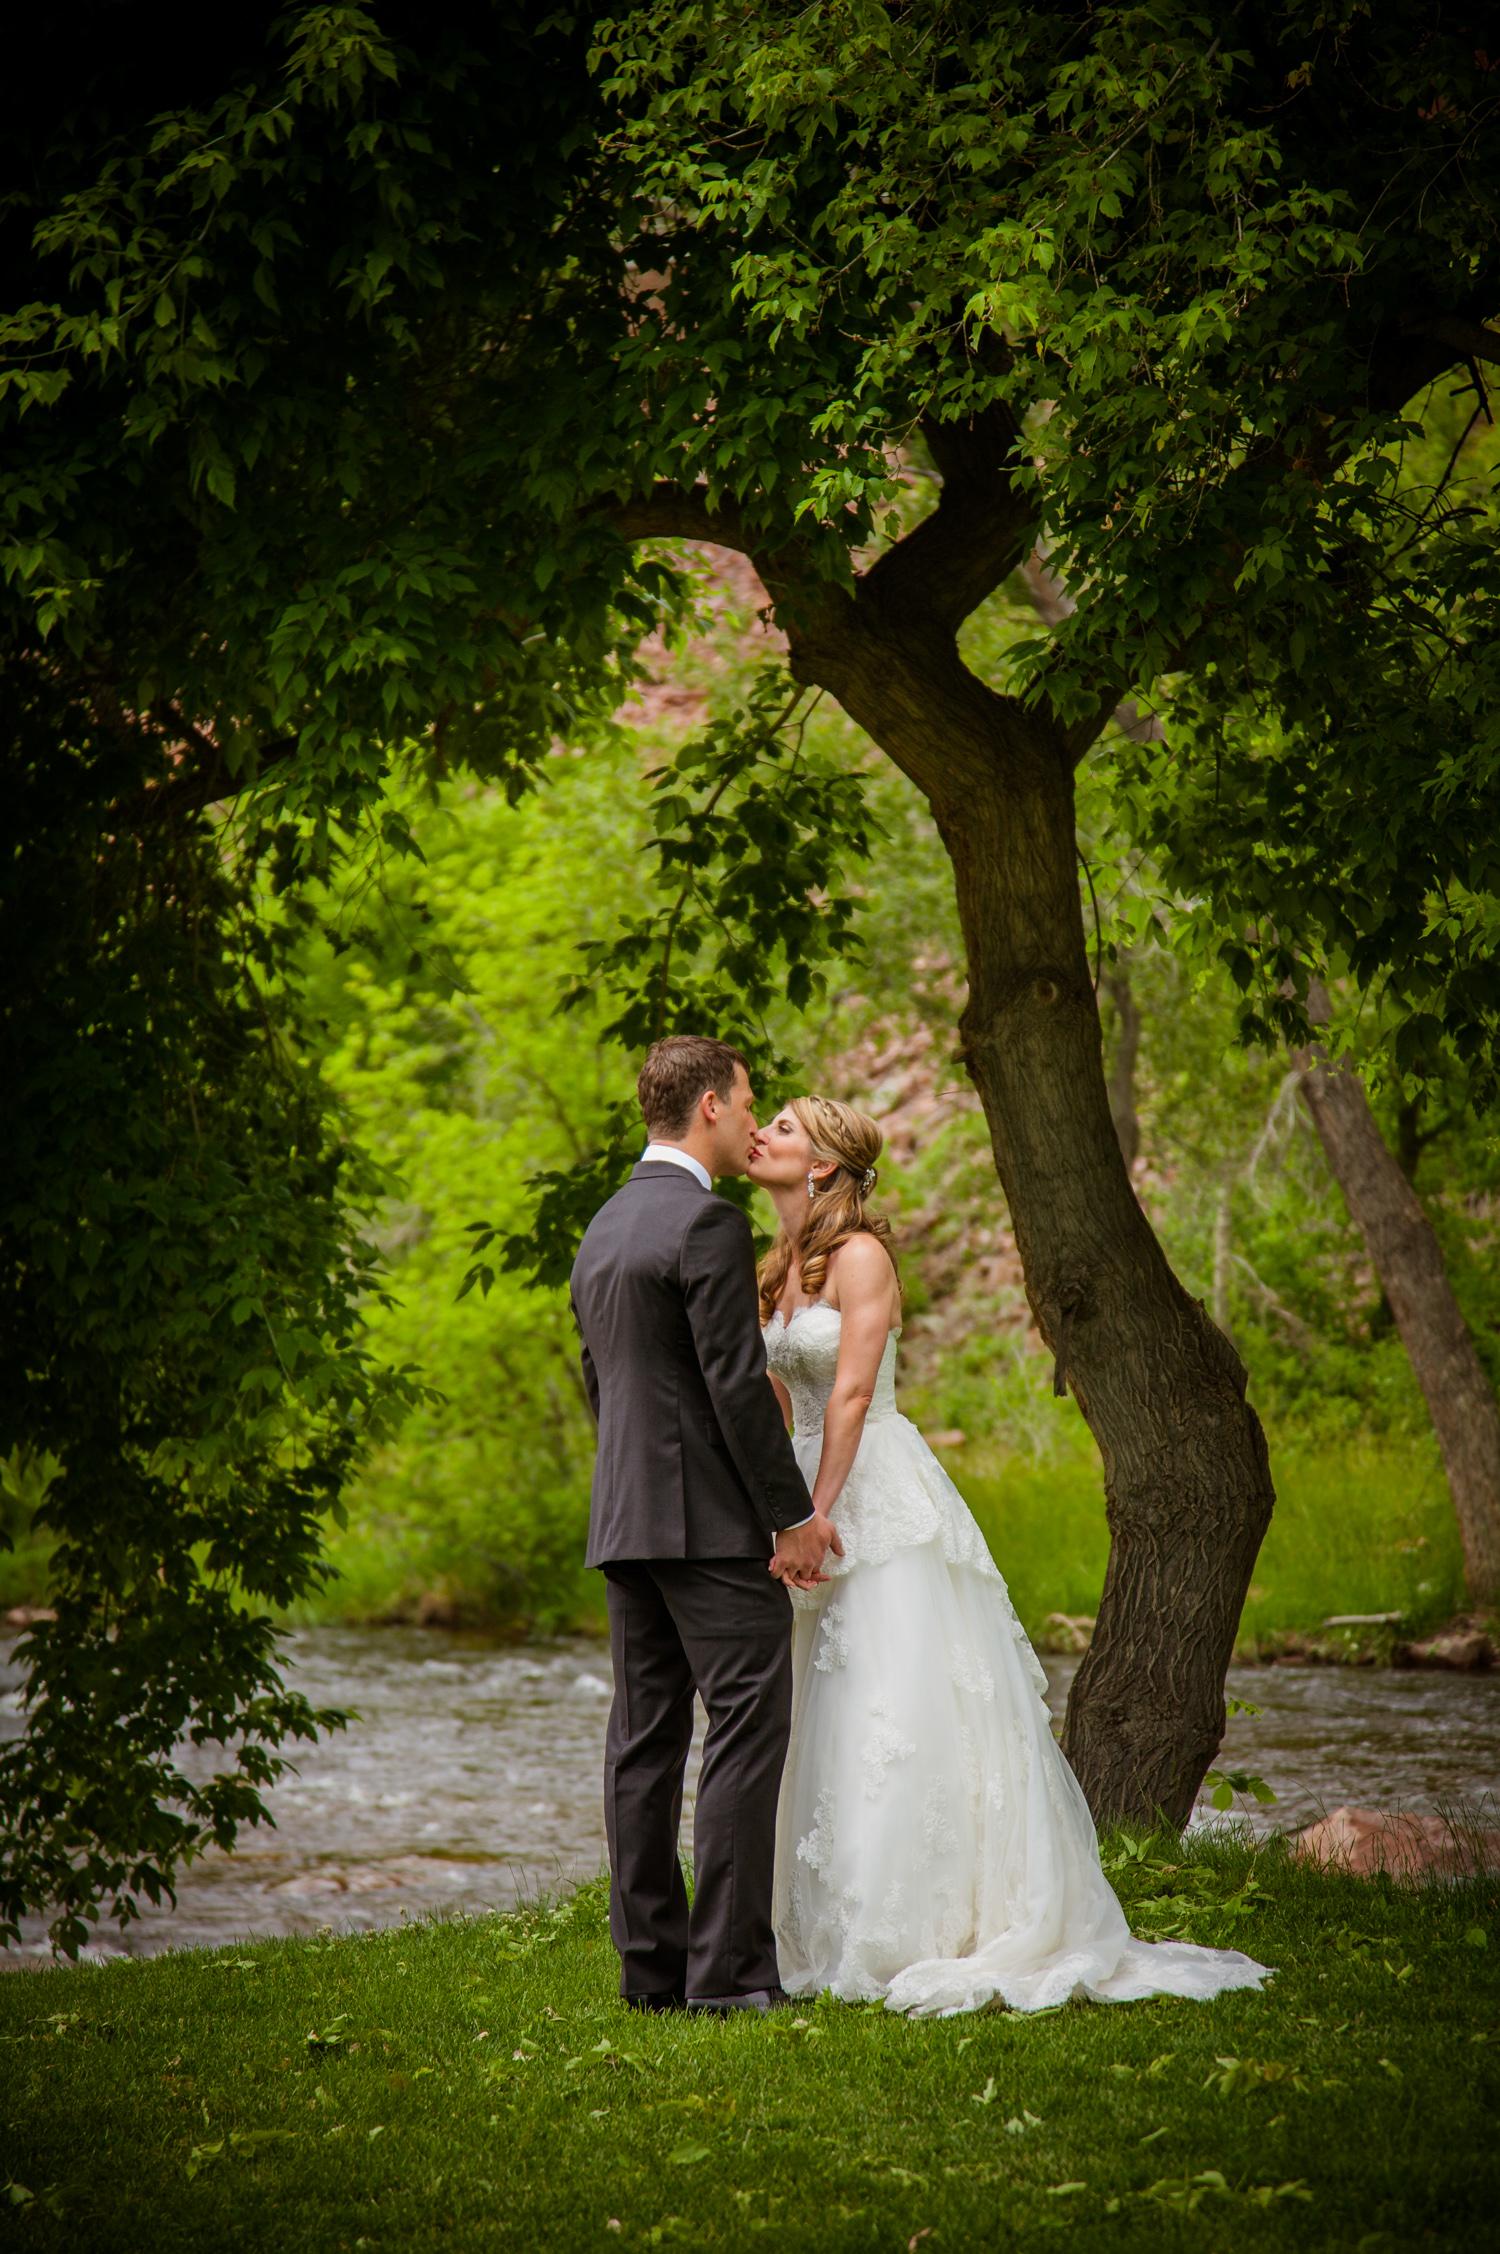 Planet_Bluegrass_Lyons_Wedding_025.JPG